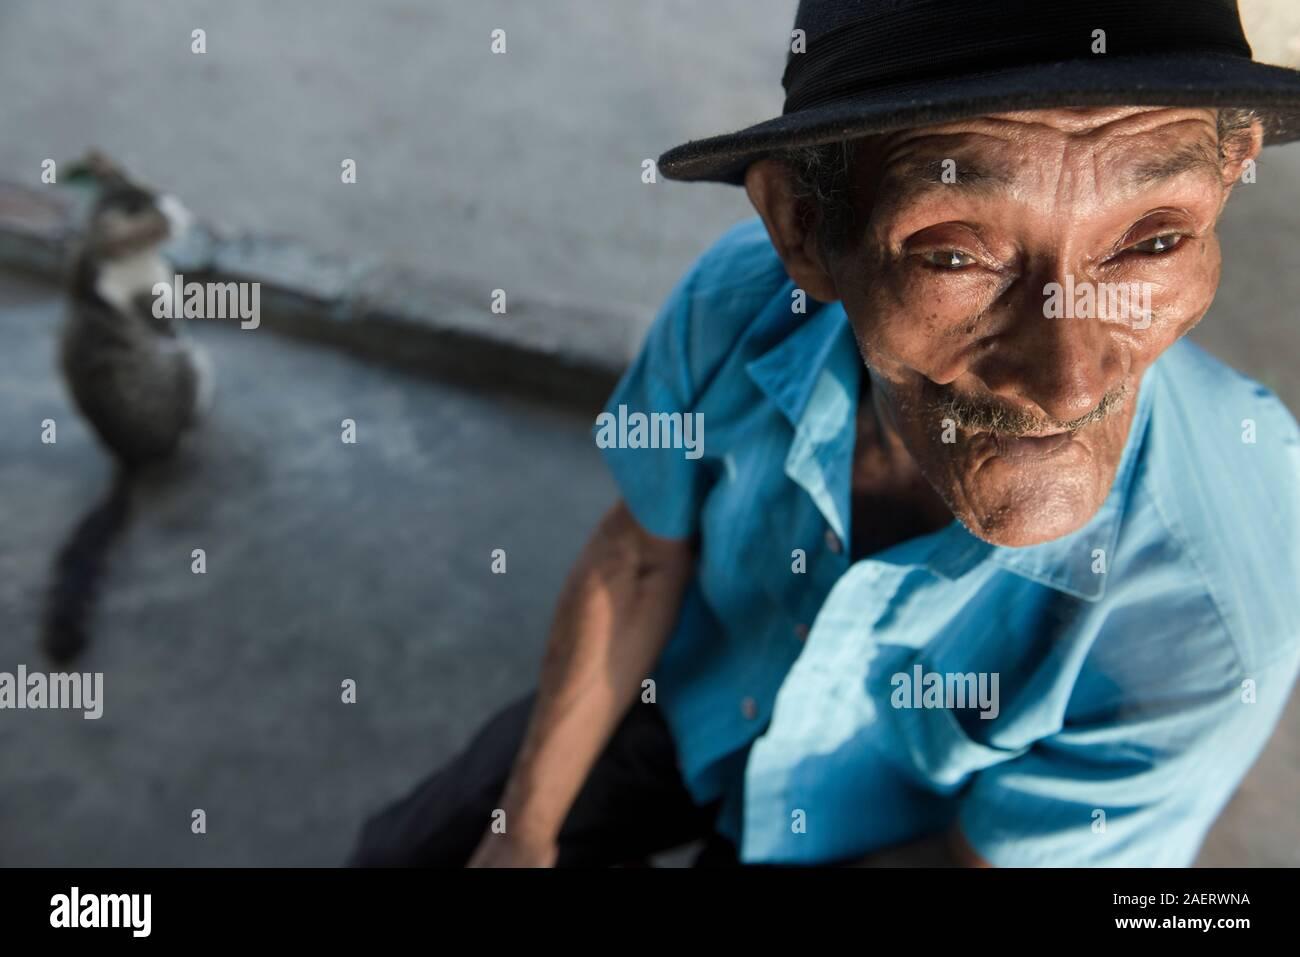 Old man in Juazeiro do Norte, northeast Brazil Stock Photo